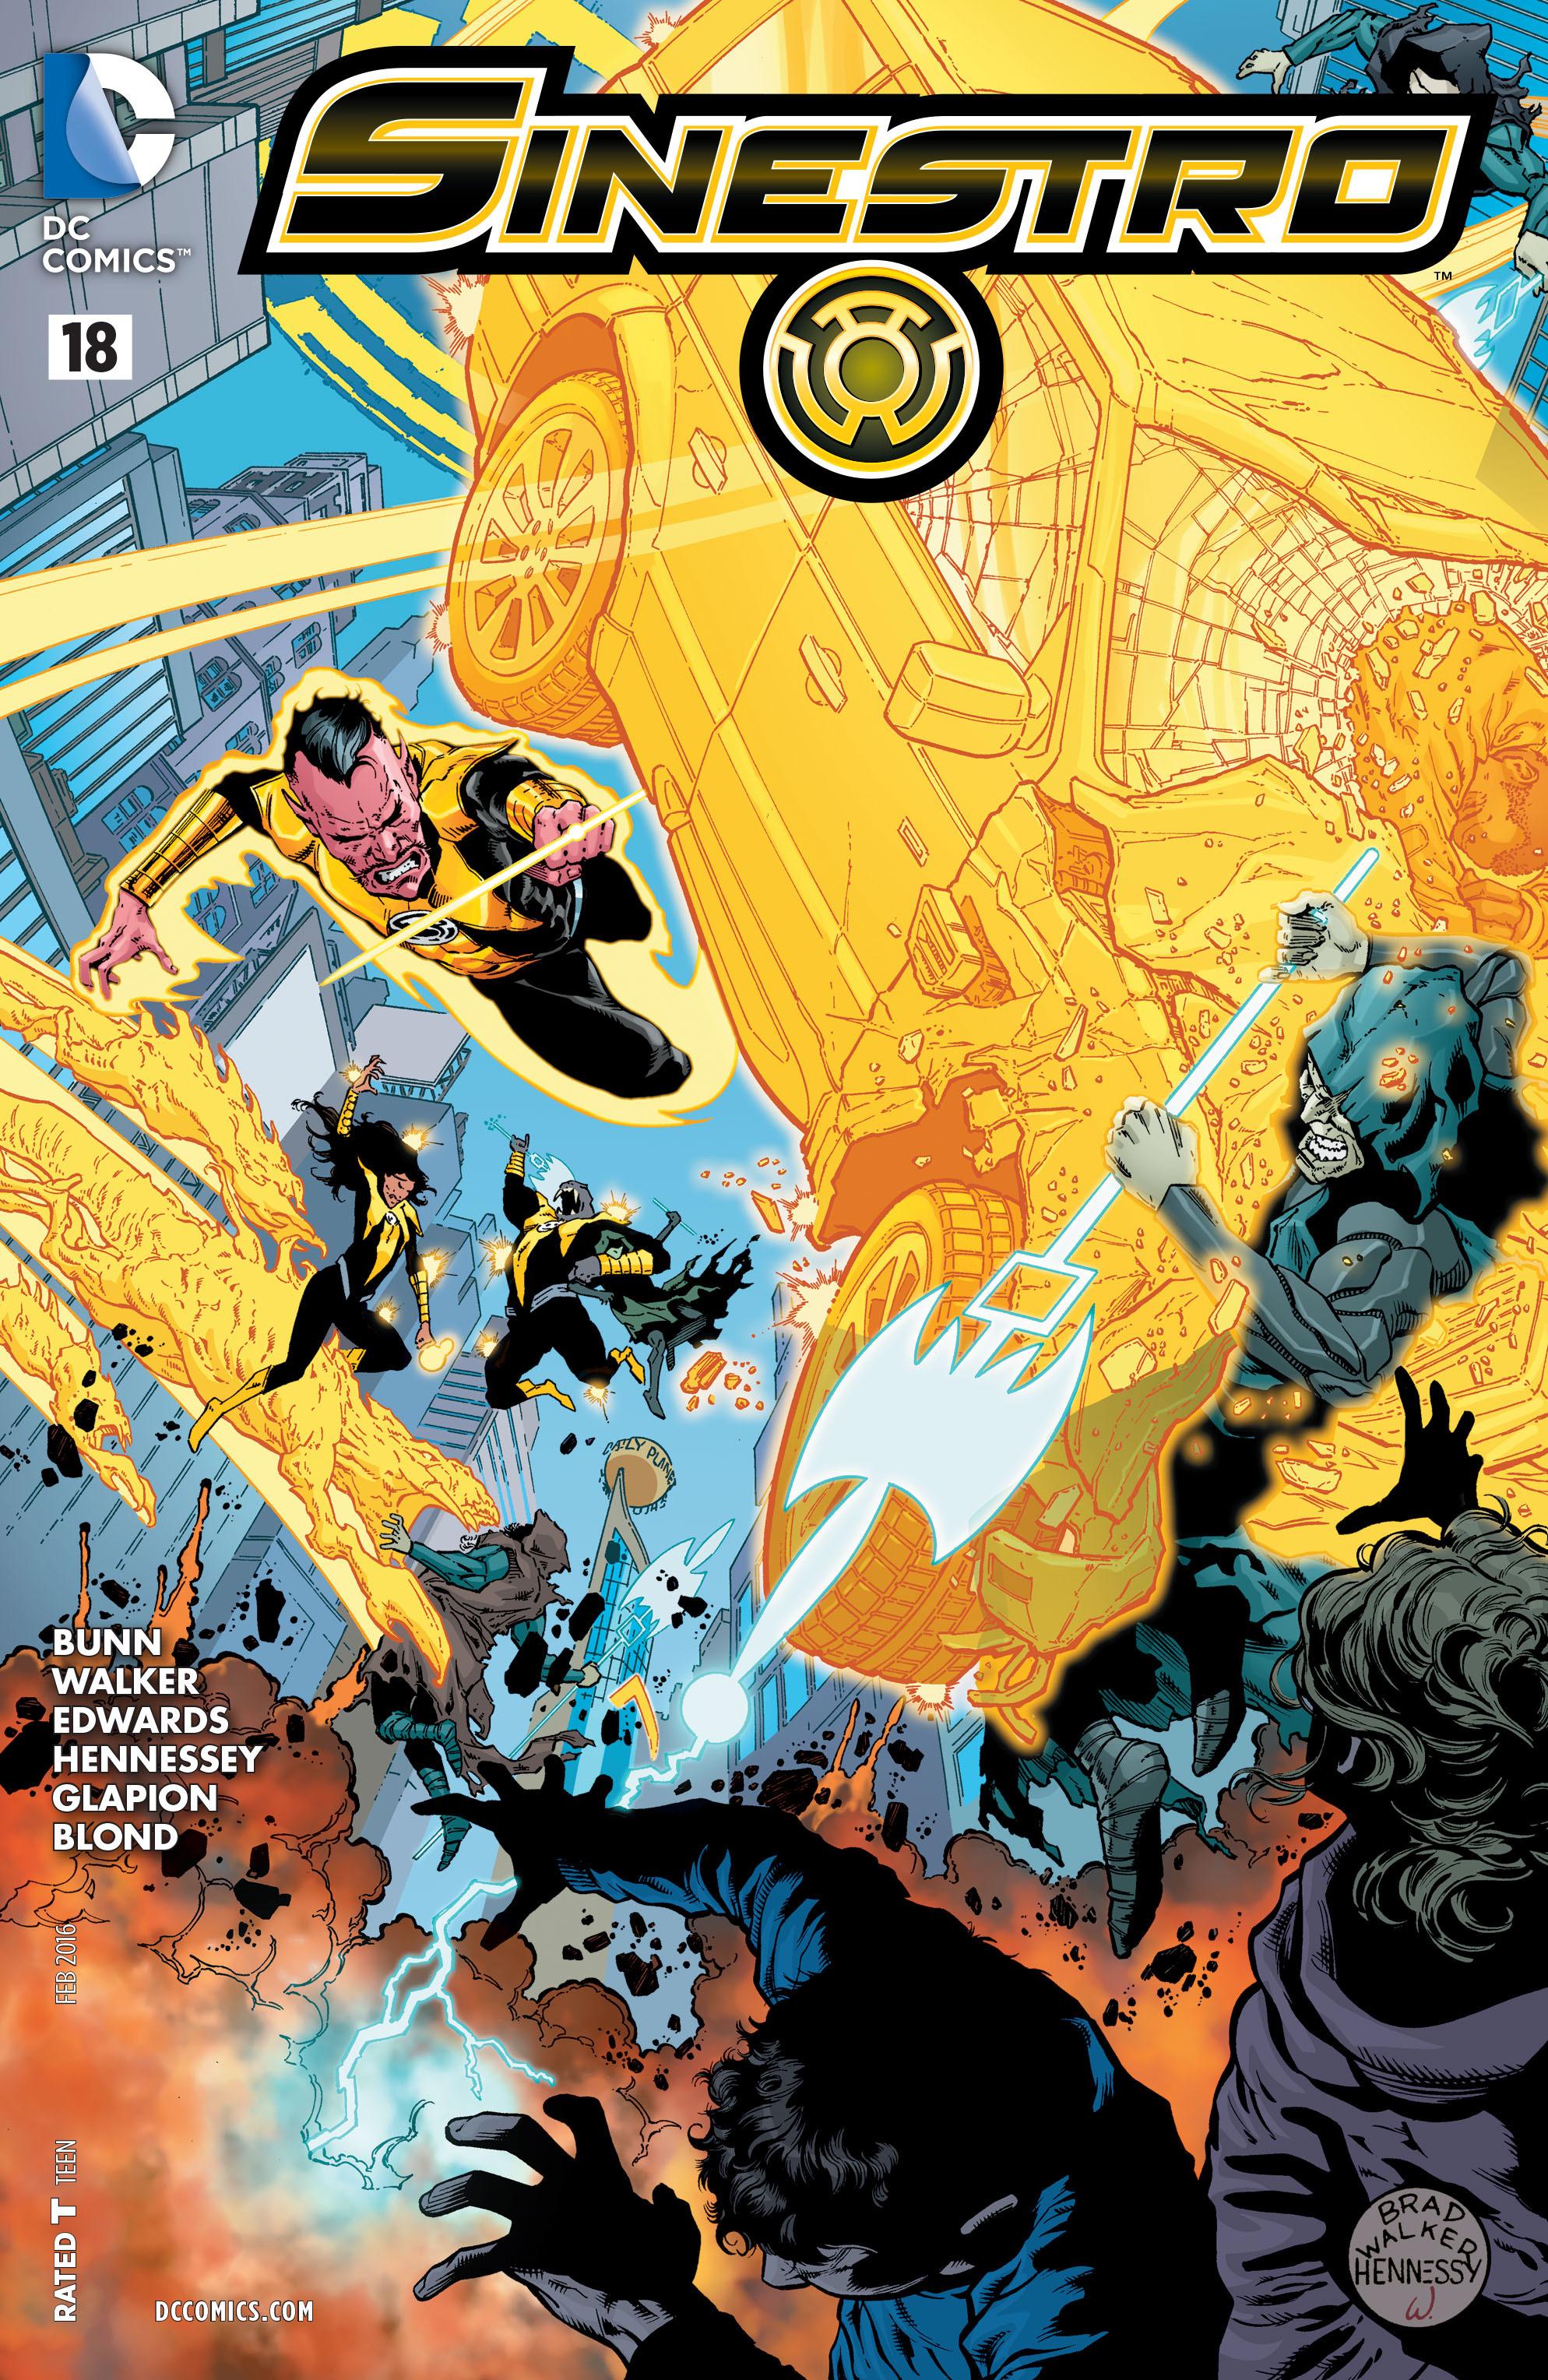 Read online Sinestro comic -  Issue #18 - 1